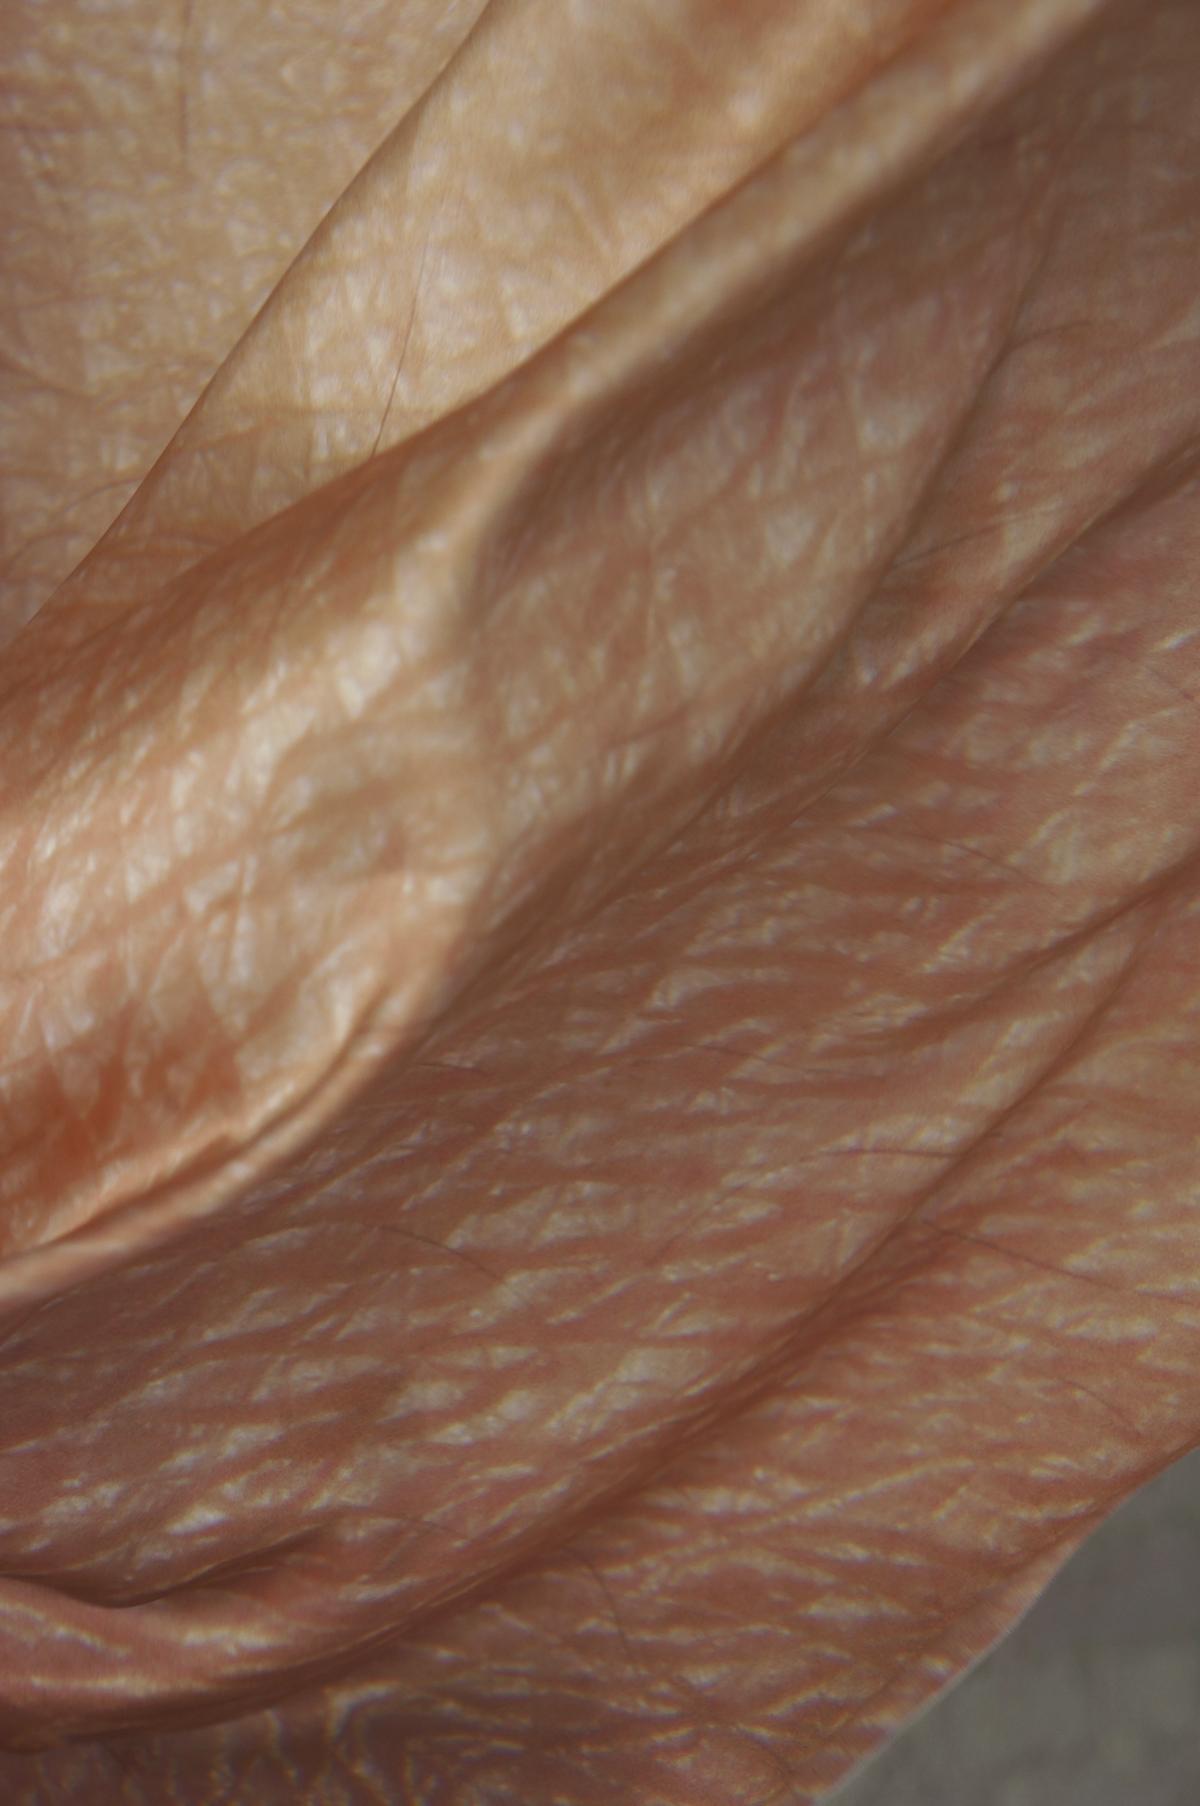 2015-06-23_20-53-03_-Marie-Eve-KR53_bearbeitet